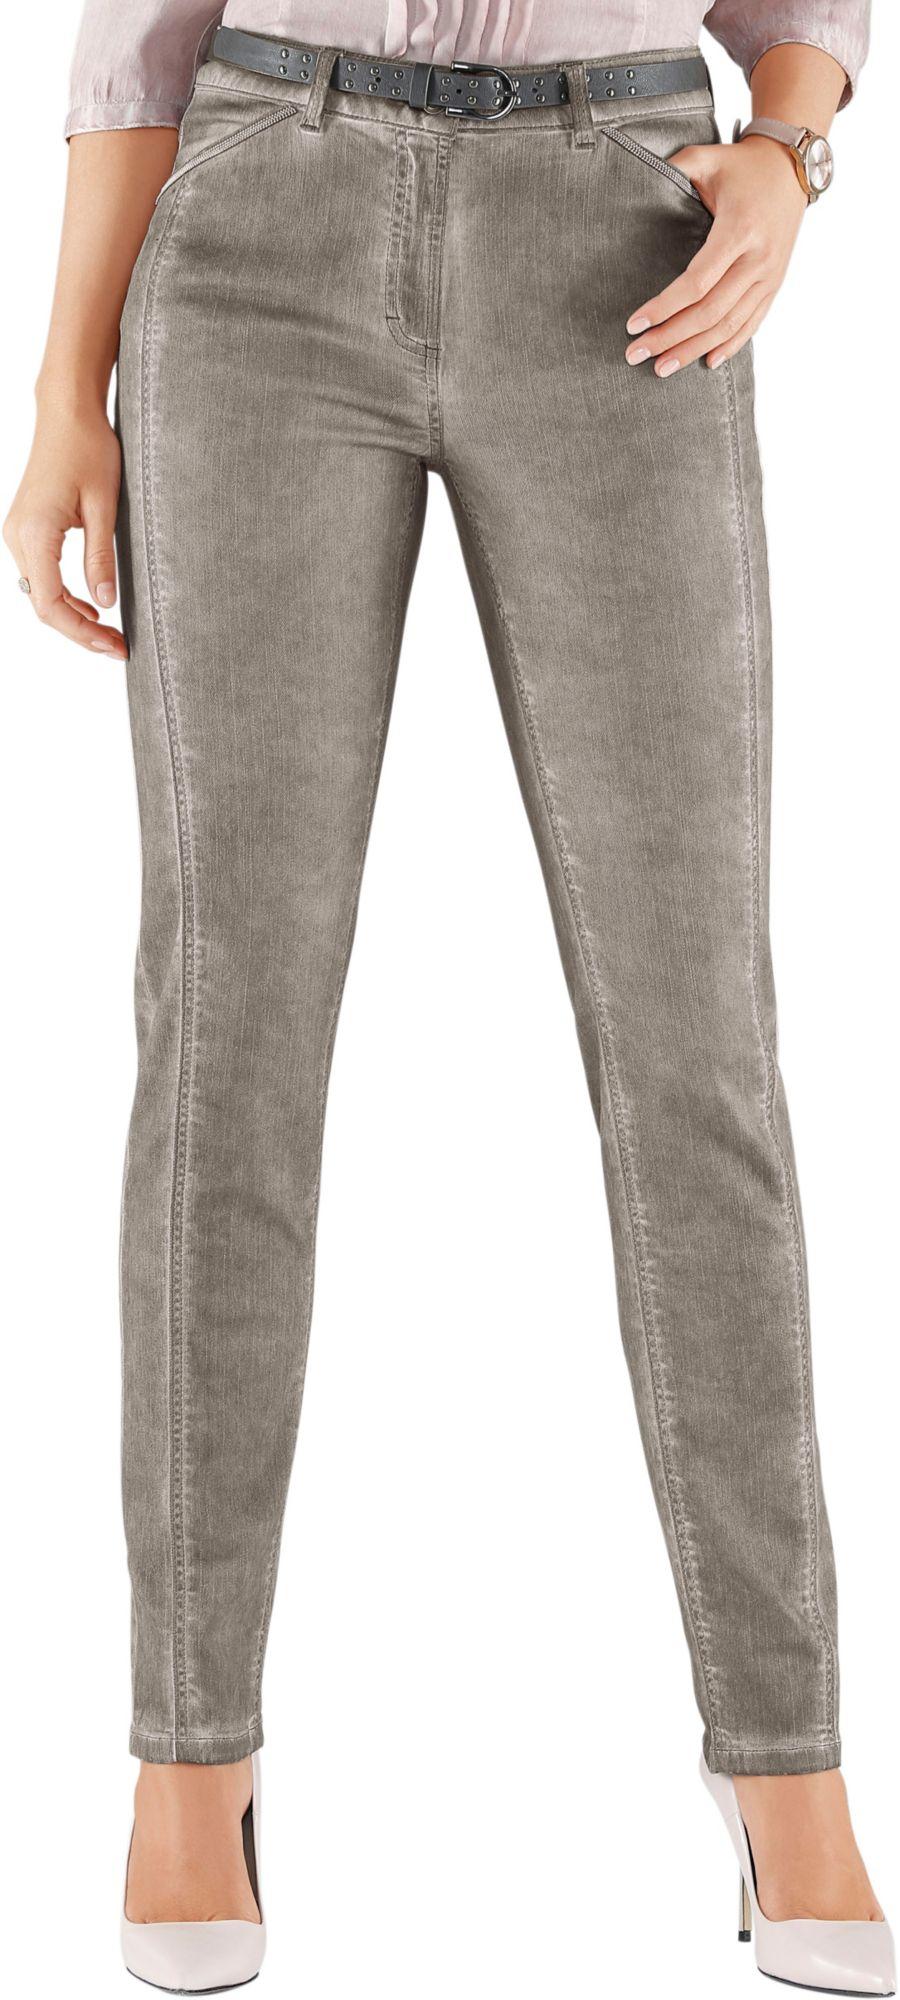 ALESSA W Alessa W. Jeans in angesagter »oil-dyed«-Optik